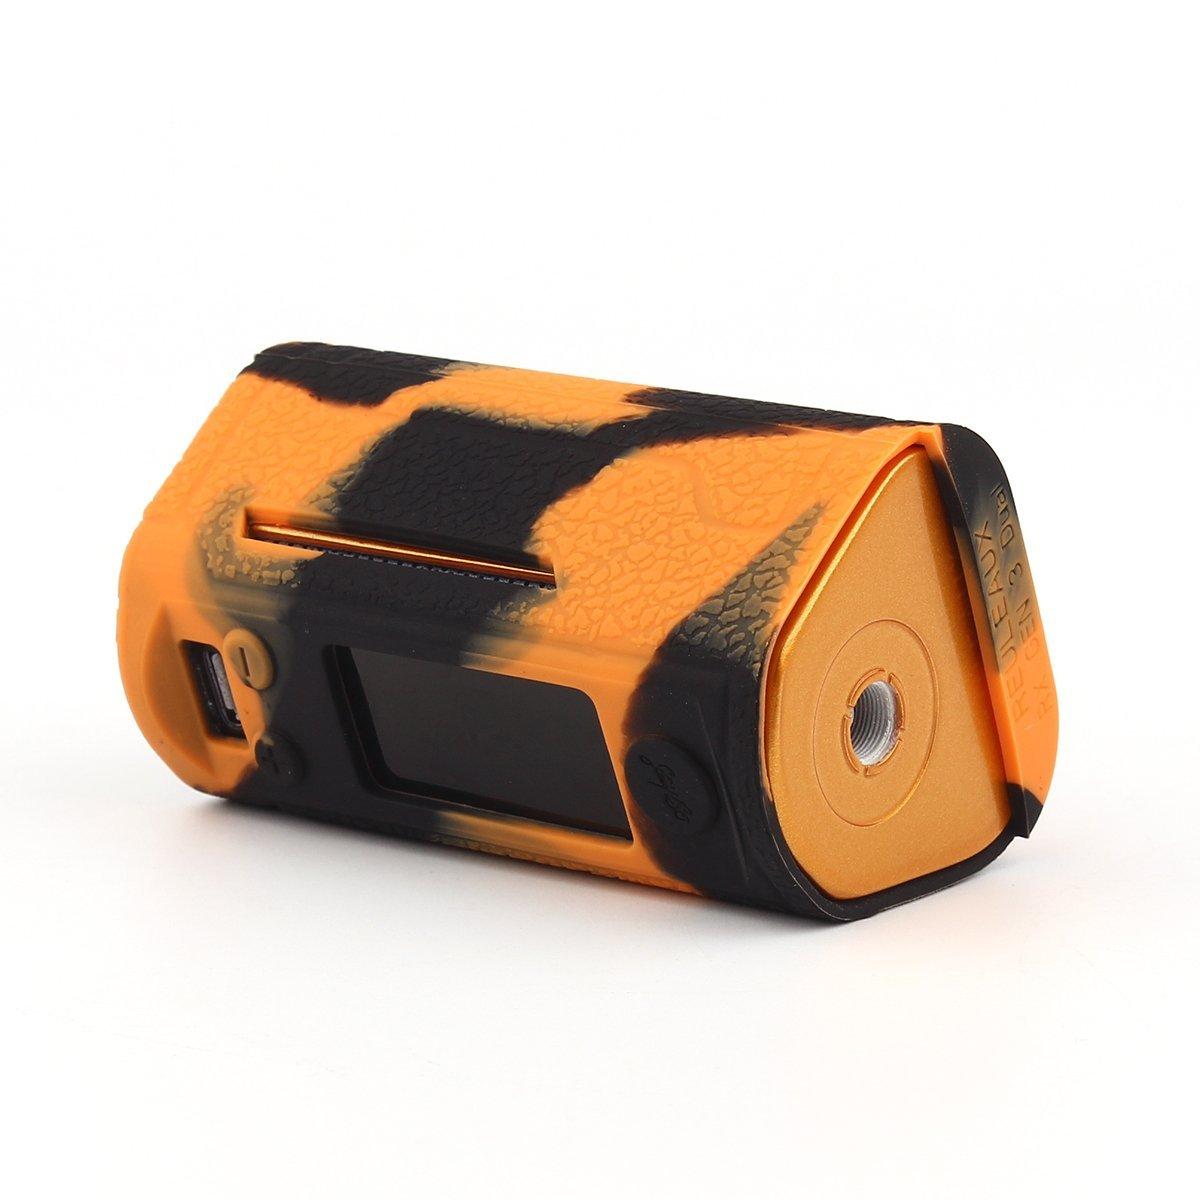 Schwarz-Gr/ün CEOKS f/ür Wismec RX Gen3 Dual 230w H/ülle RutschfestSch/ützende Silikon-H/ülle-Abdeckungs-Verpackungs-Haut f/ür Wismec RX Gen3 Dual 230w Segeln Skin /Ärmel Case Cover